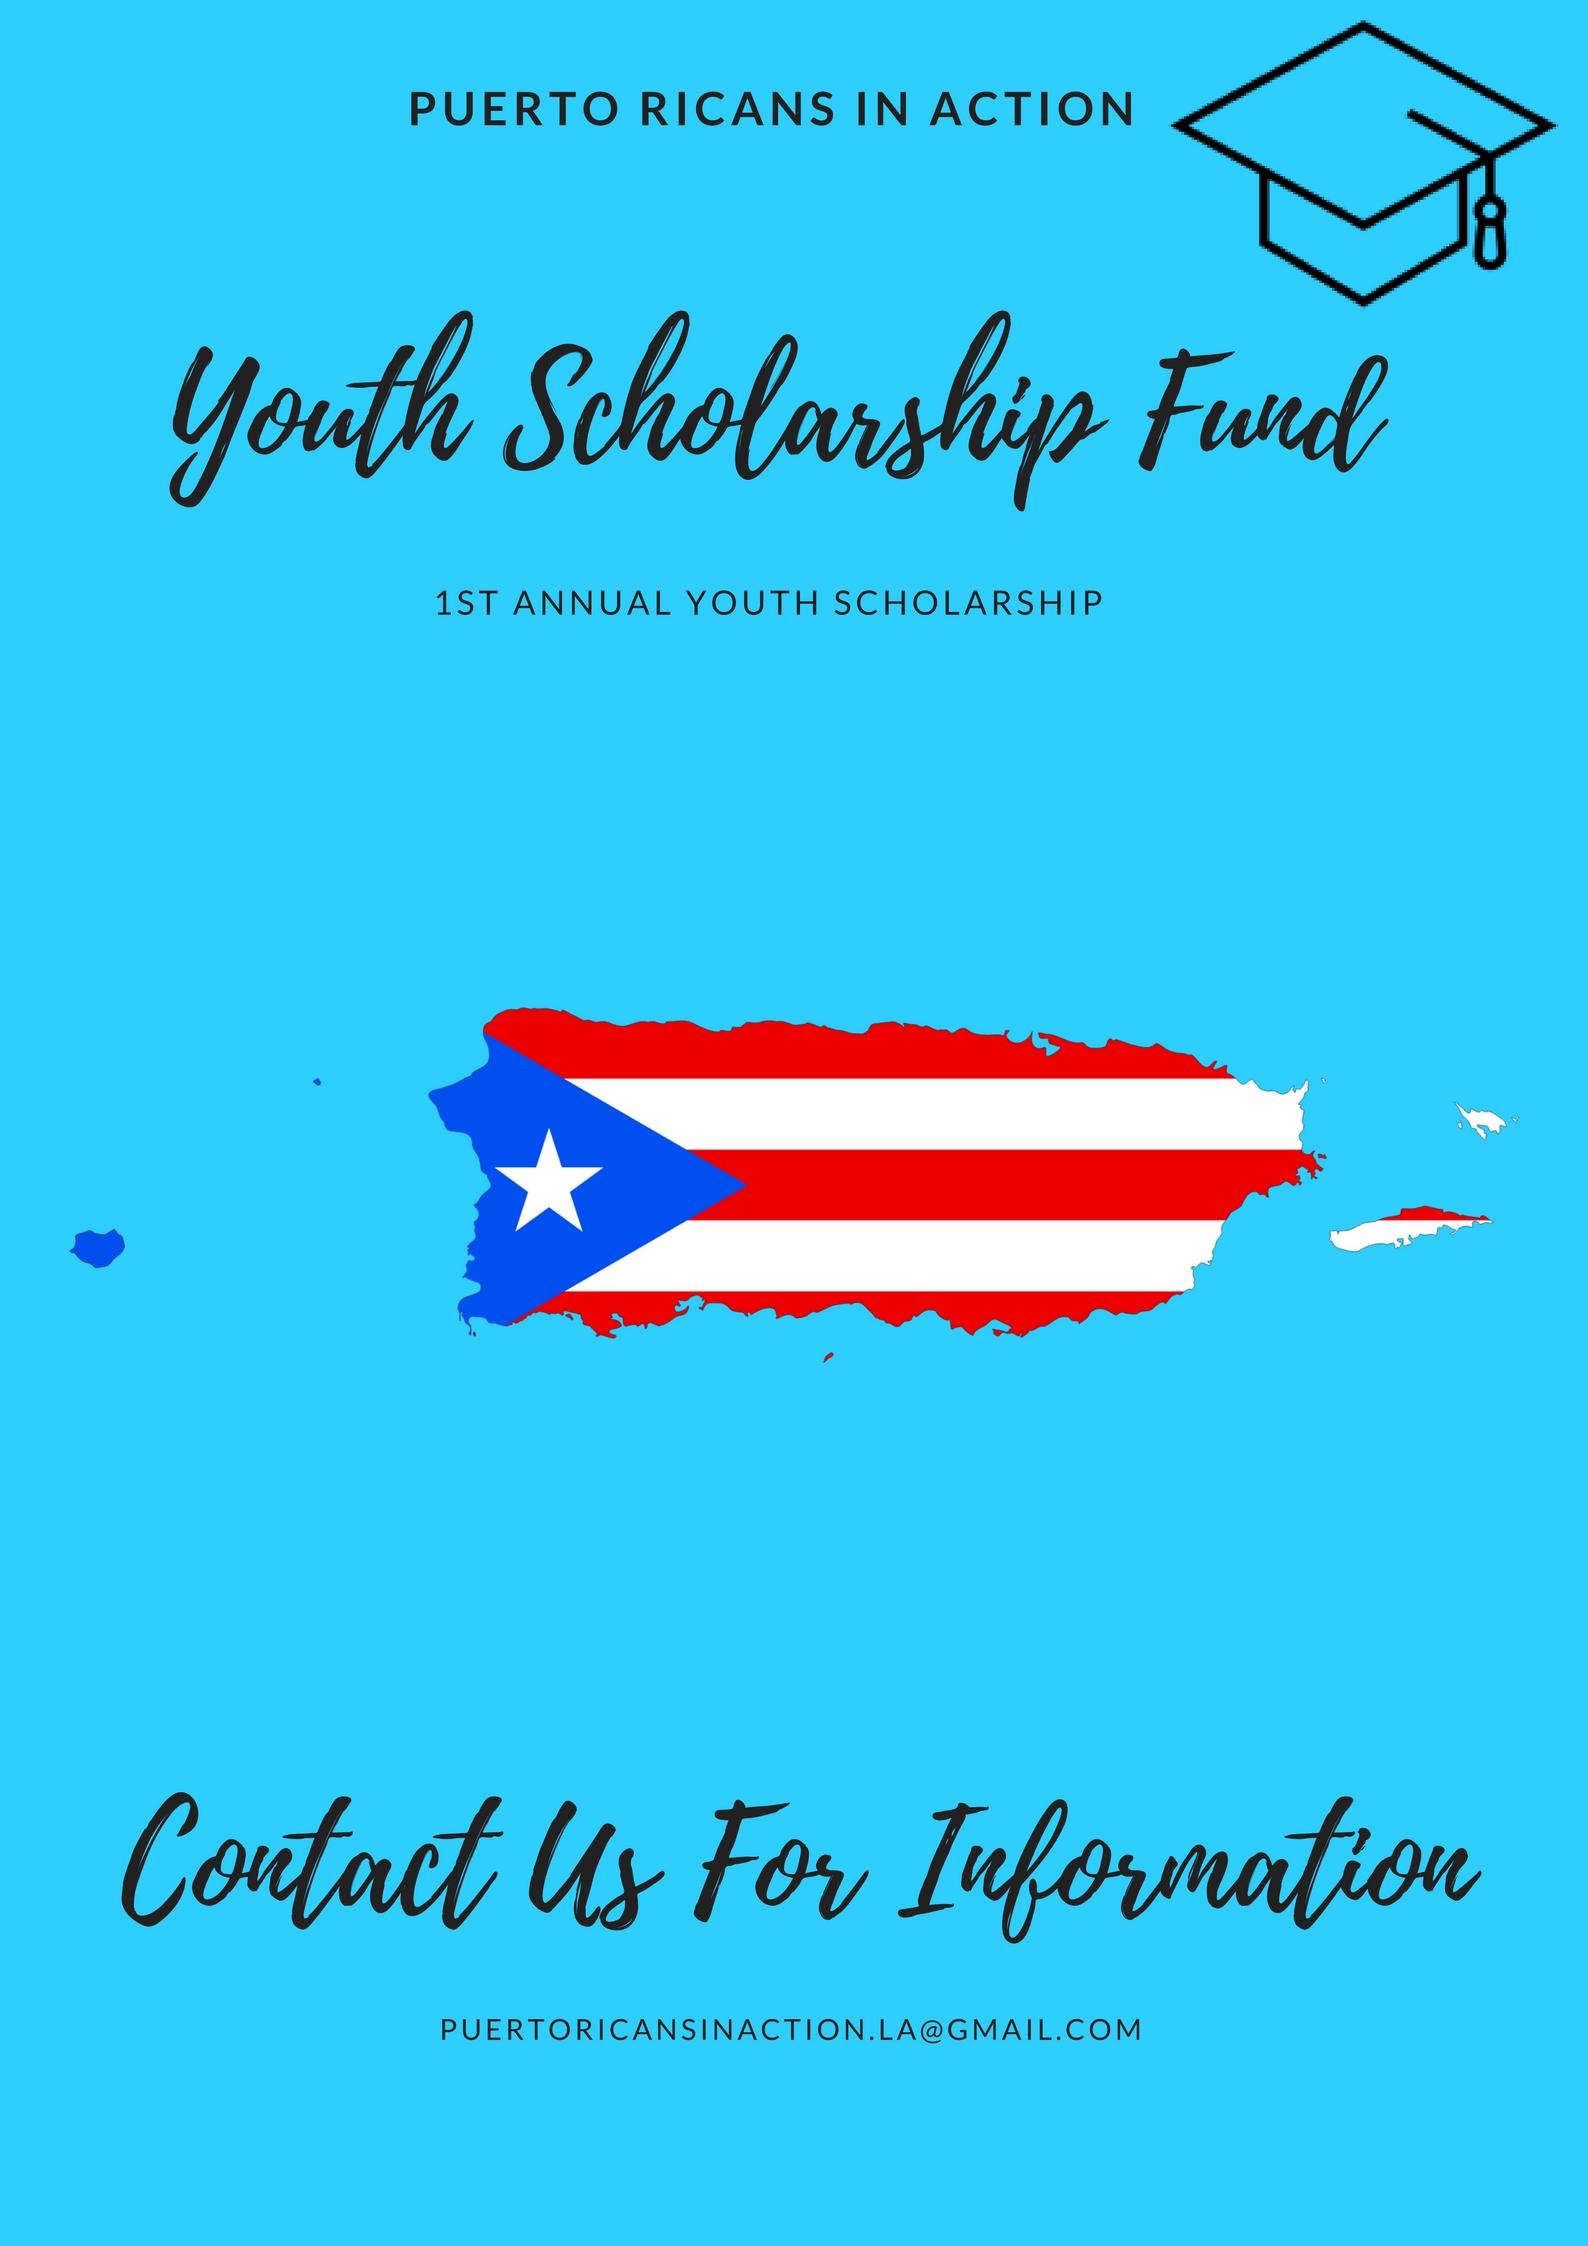 Youth Scholarship Fund